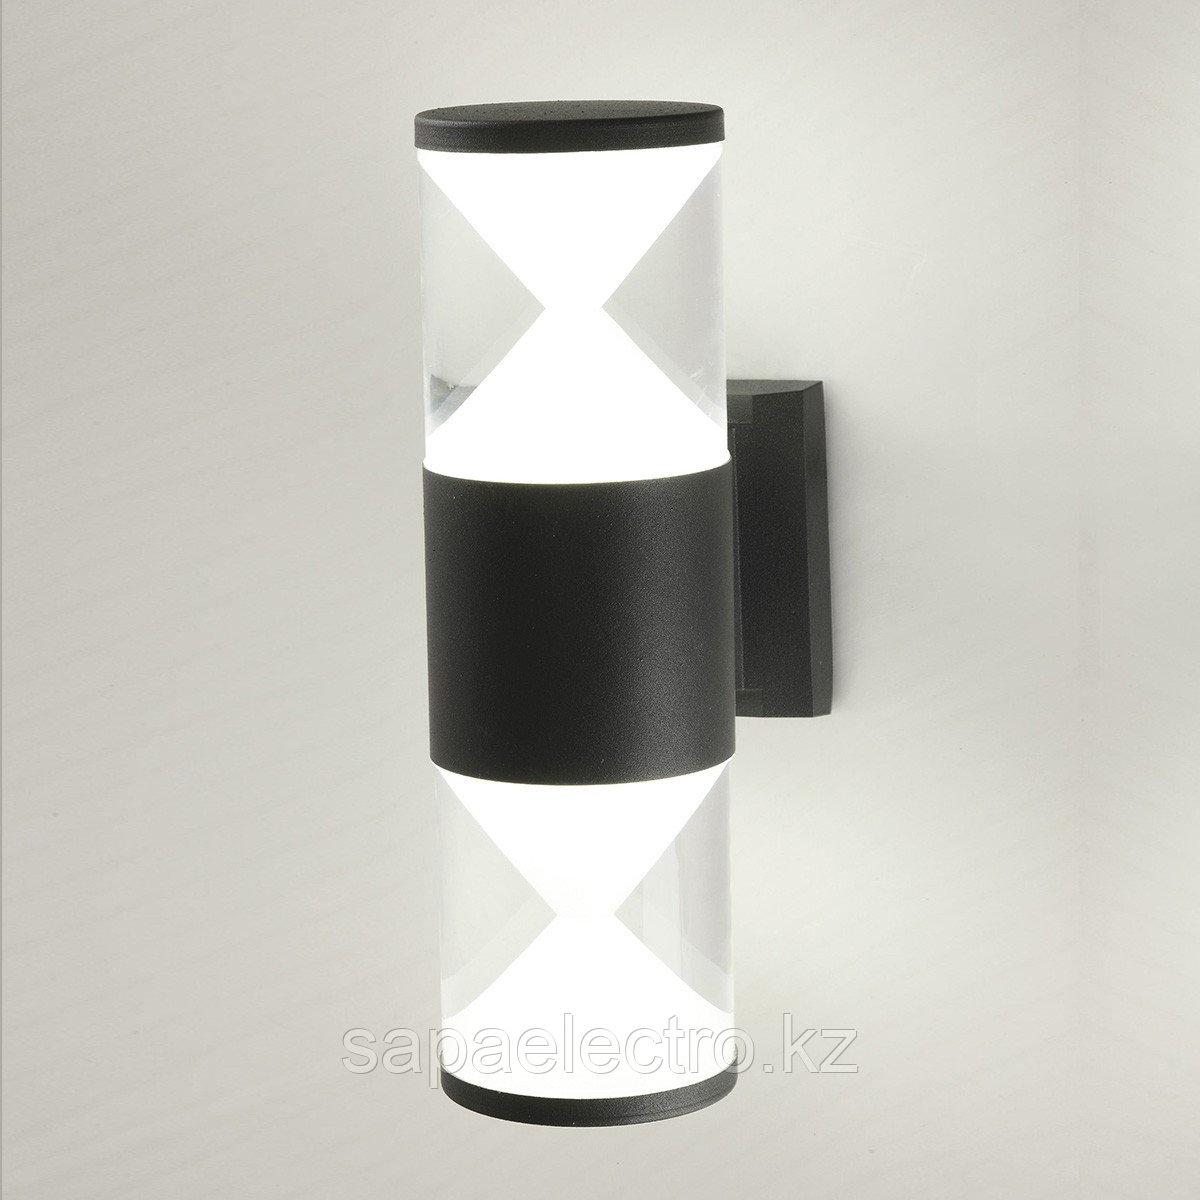 Свет-к LED B2228 2*5W Grey 5000K  (TS) 10шт